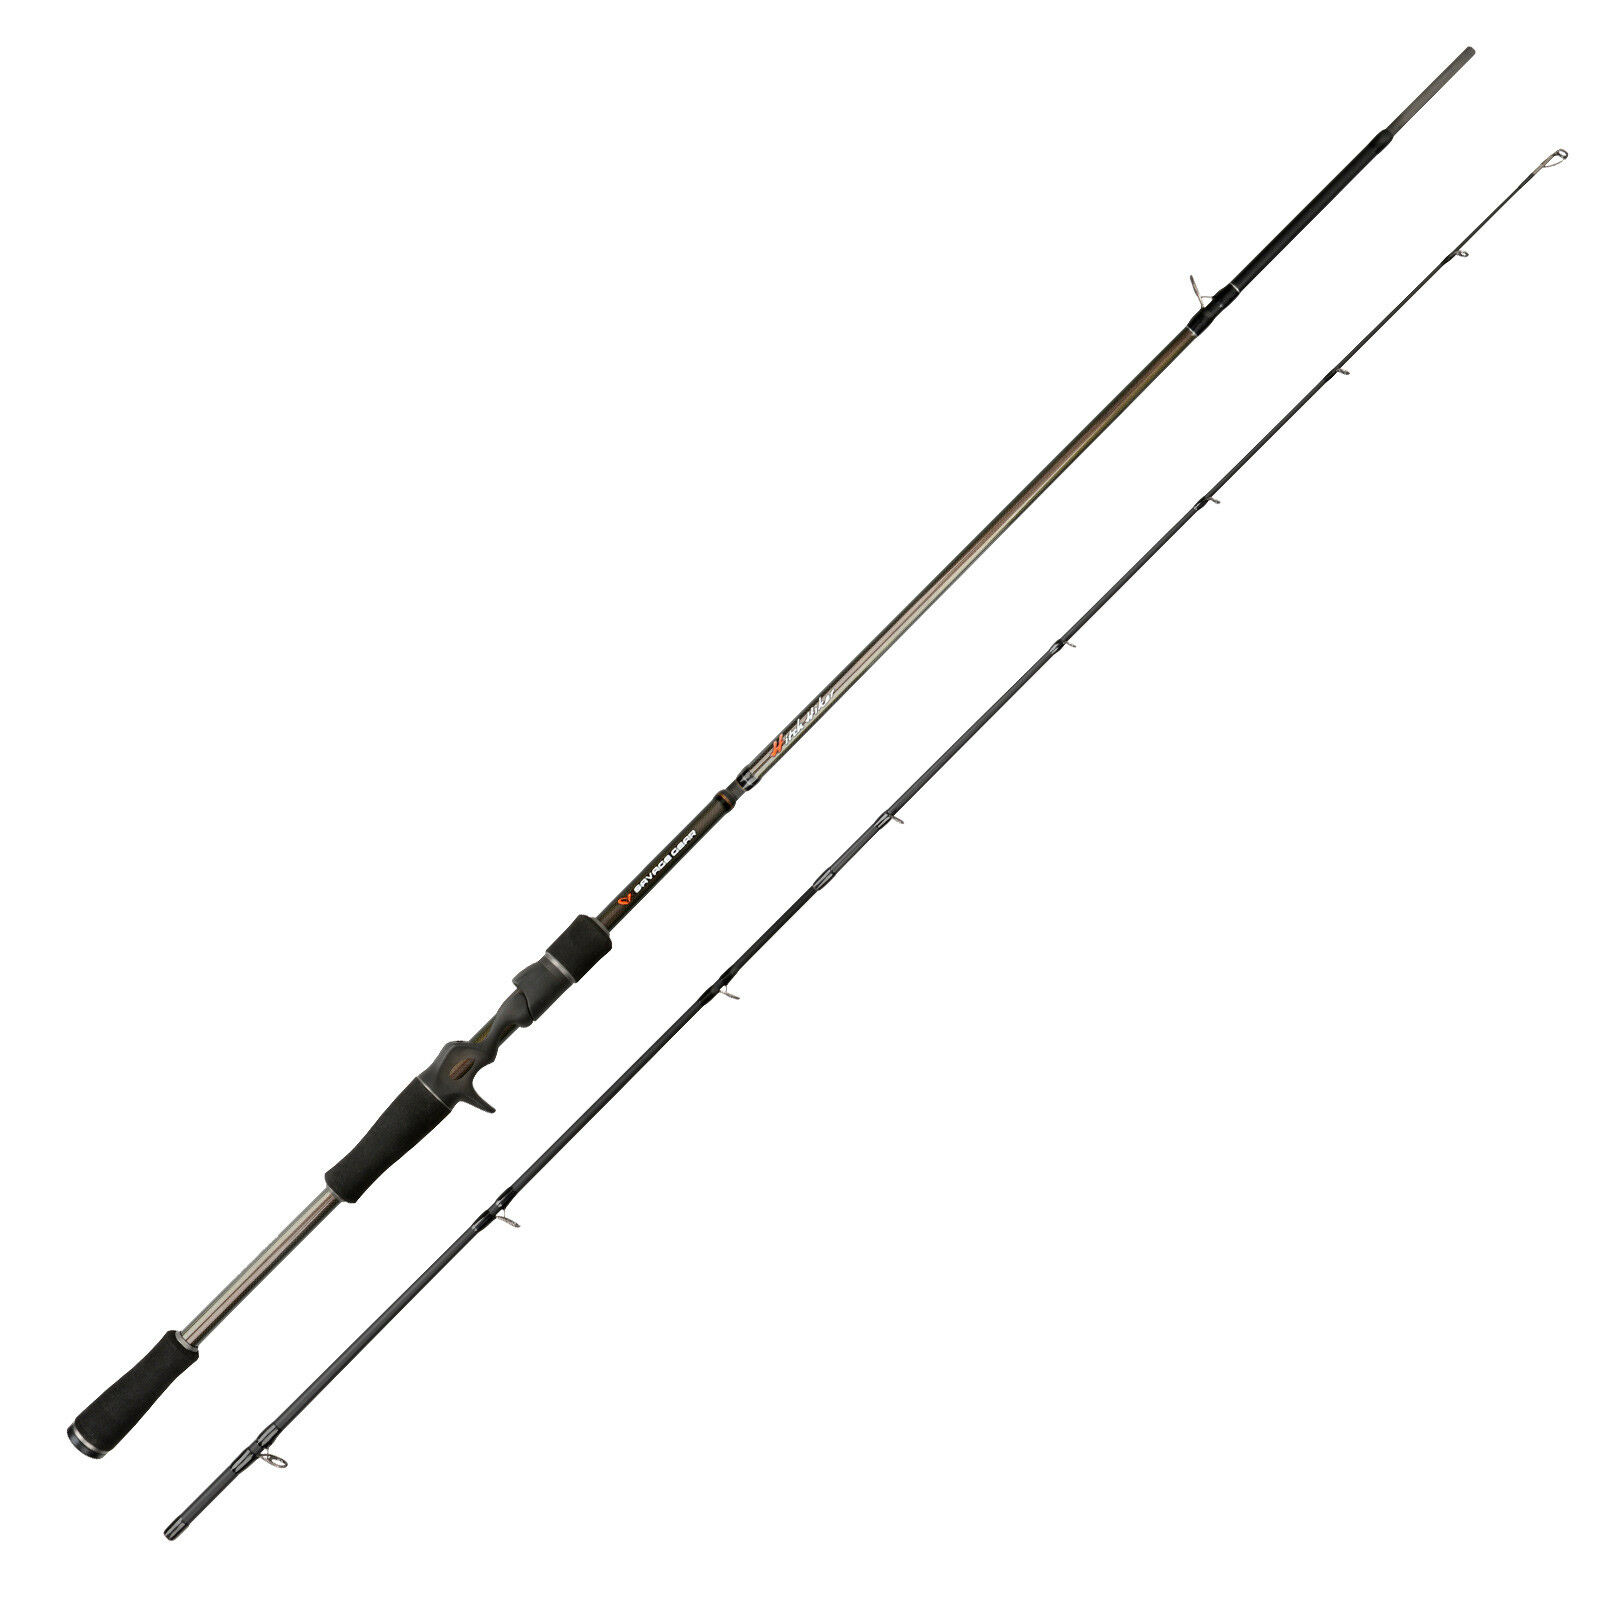 Savage Gear viaggio canna spinning pesca-Hitch Hiker trigger 2,13m 10-30g